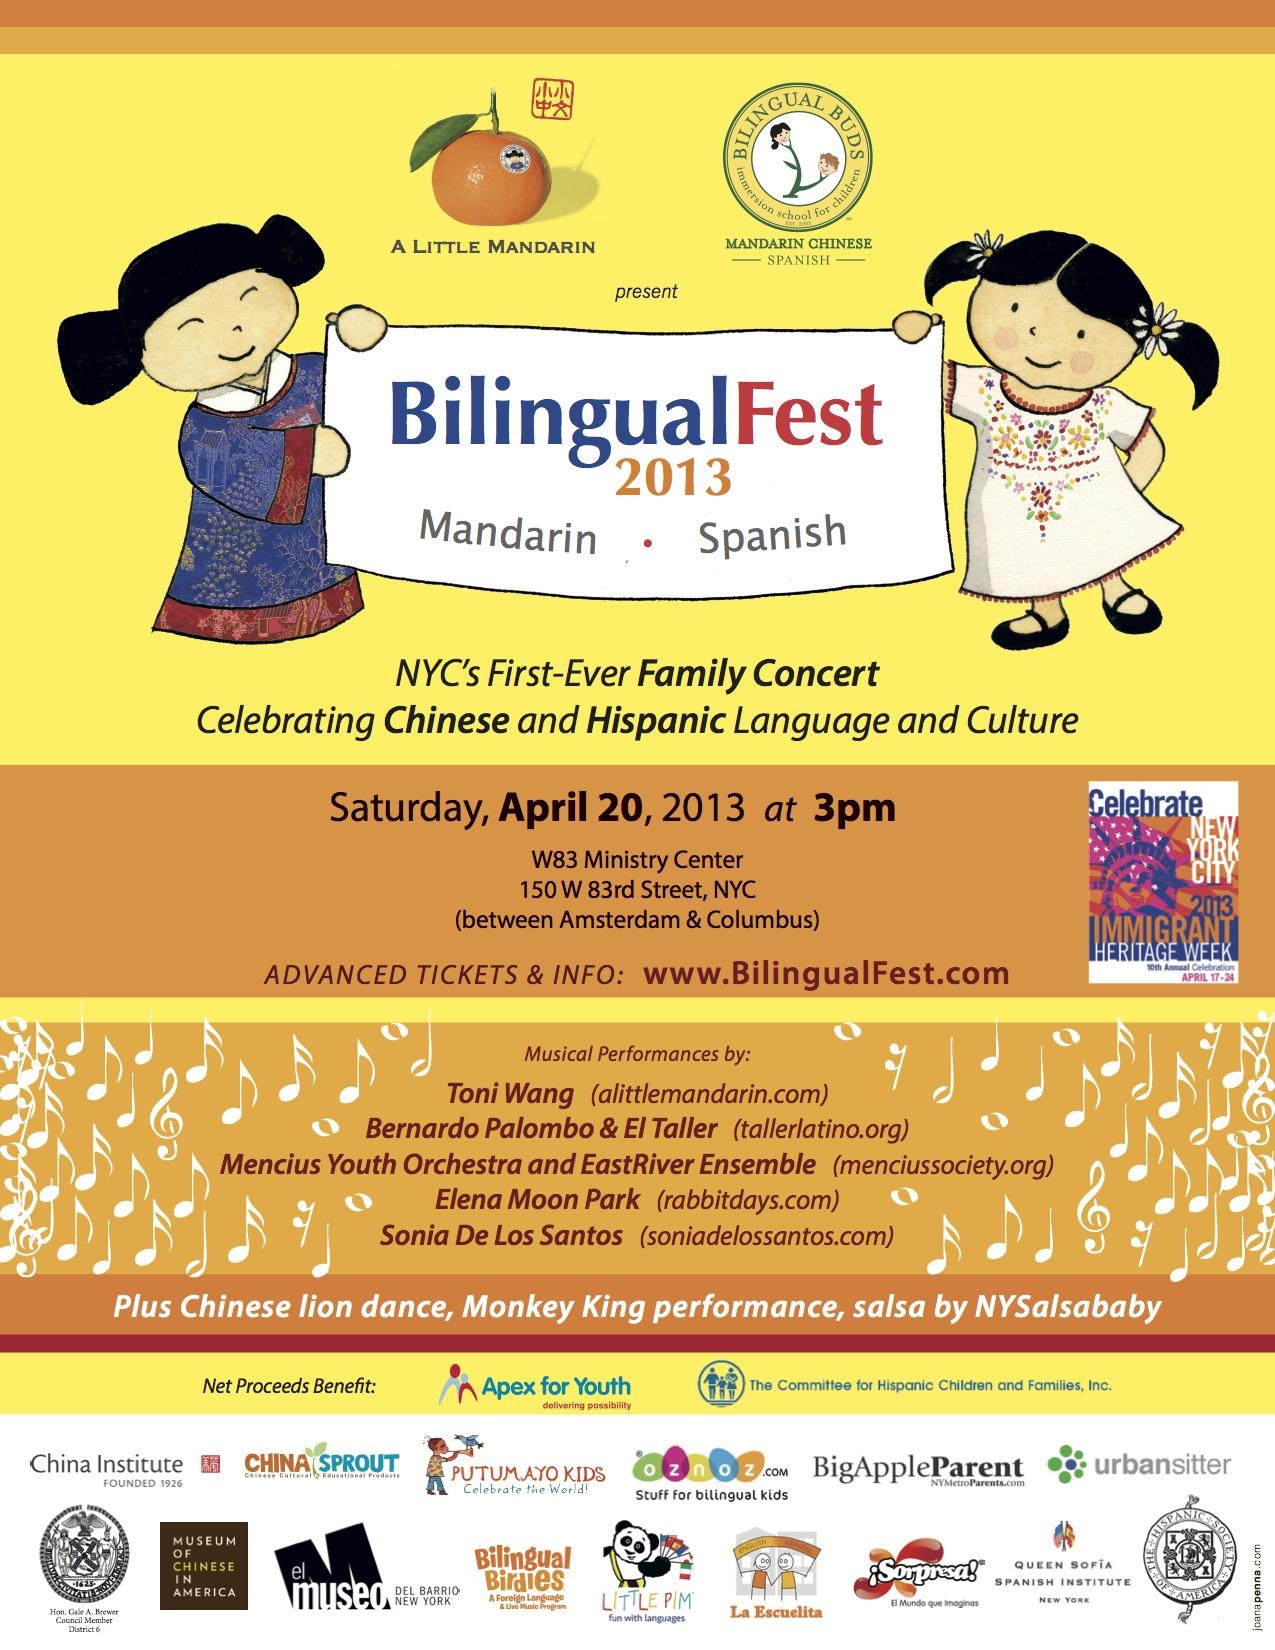 BilingualFest 2013